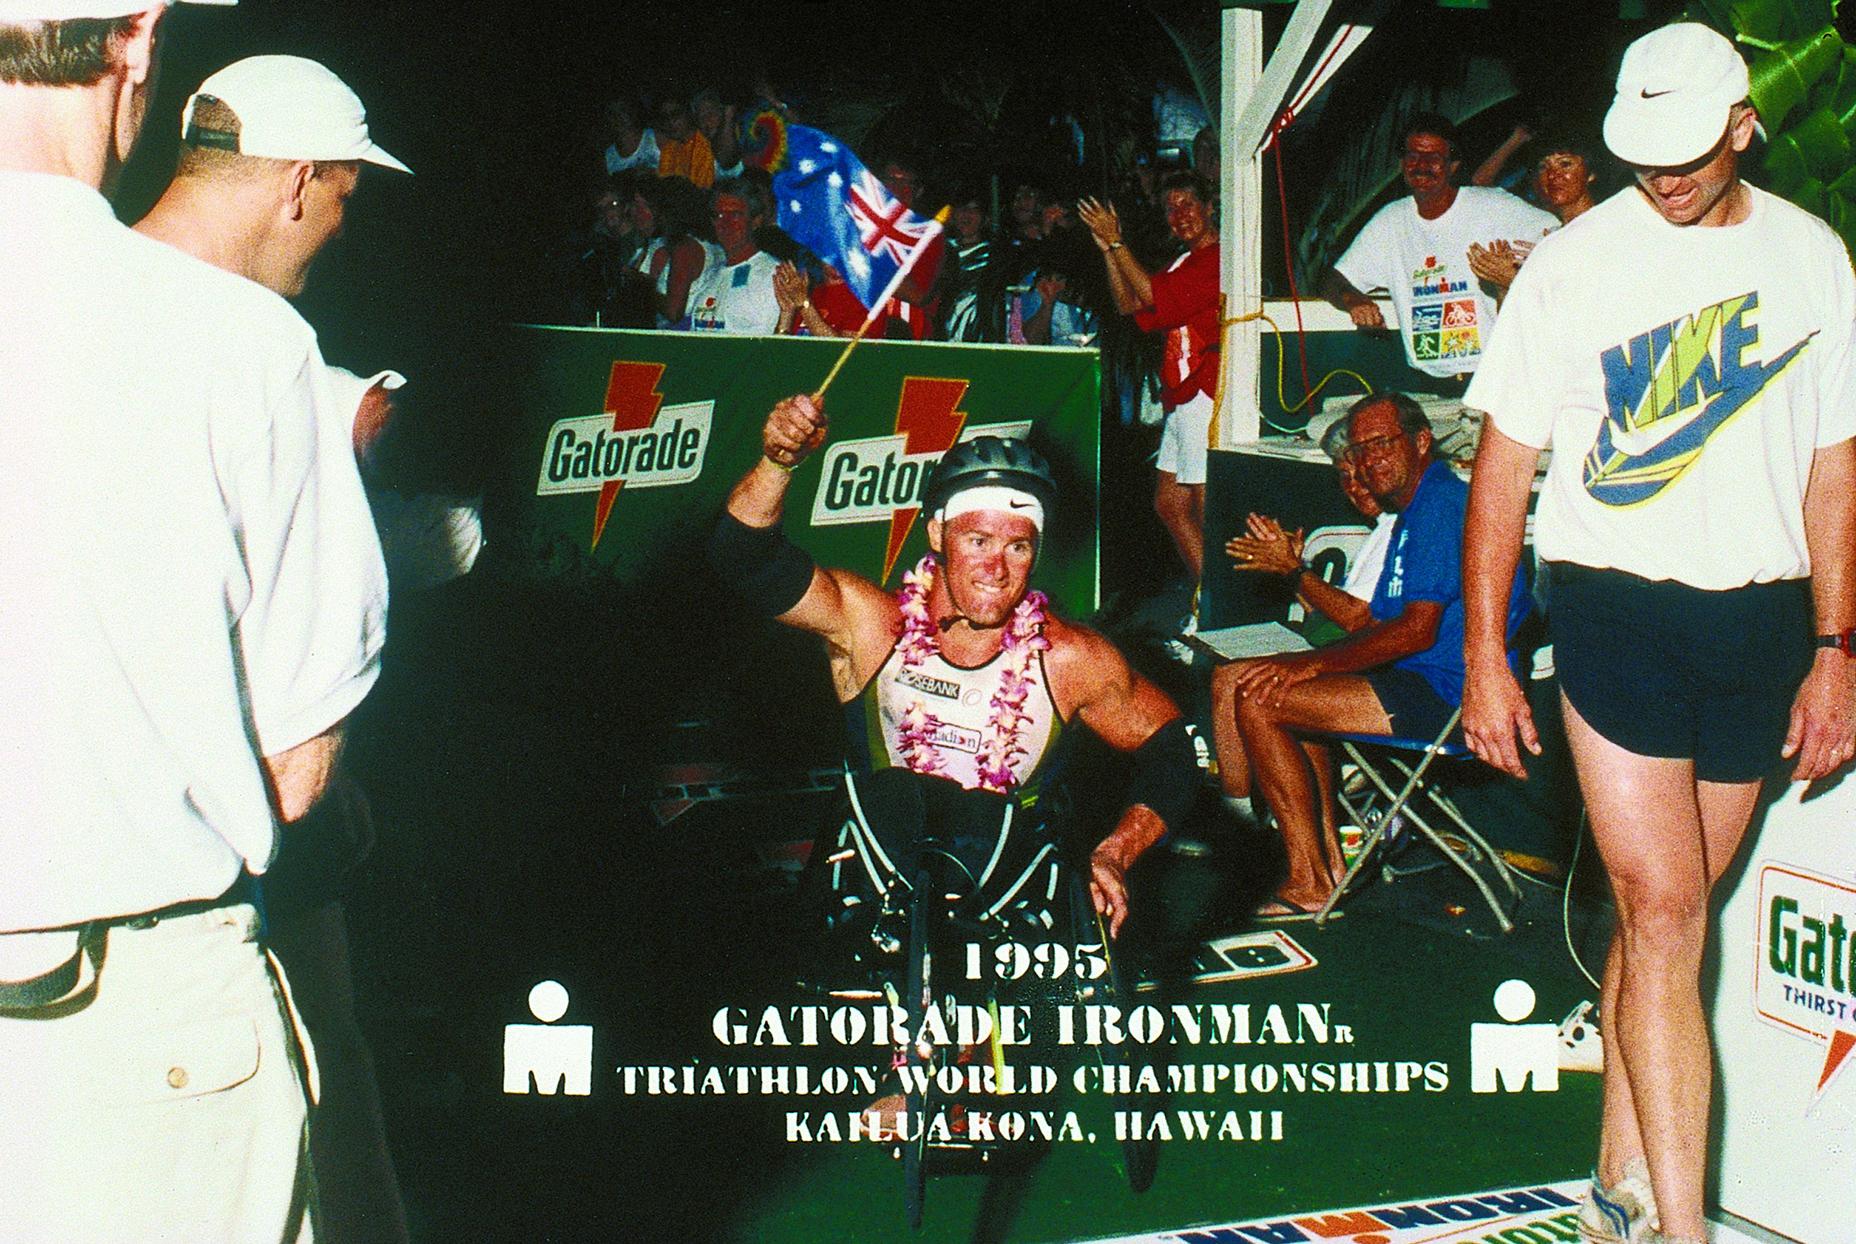 Hawaiian Ironman 1995 finish